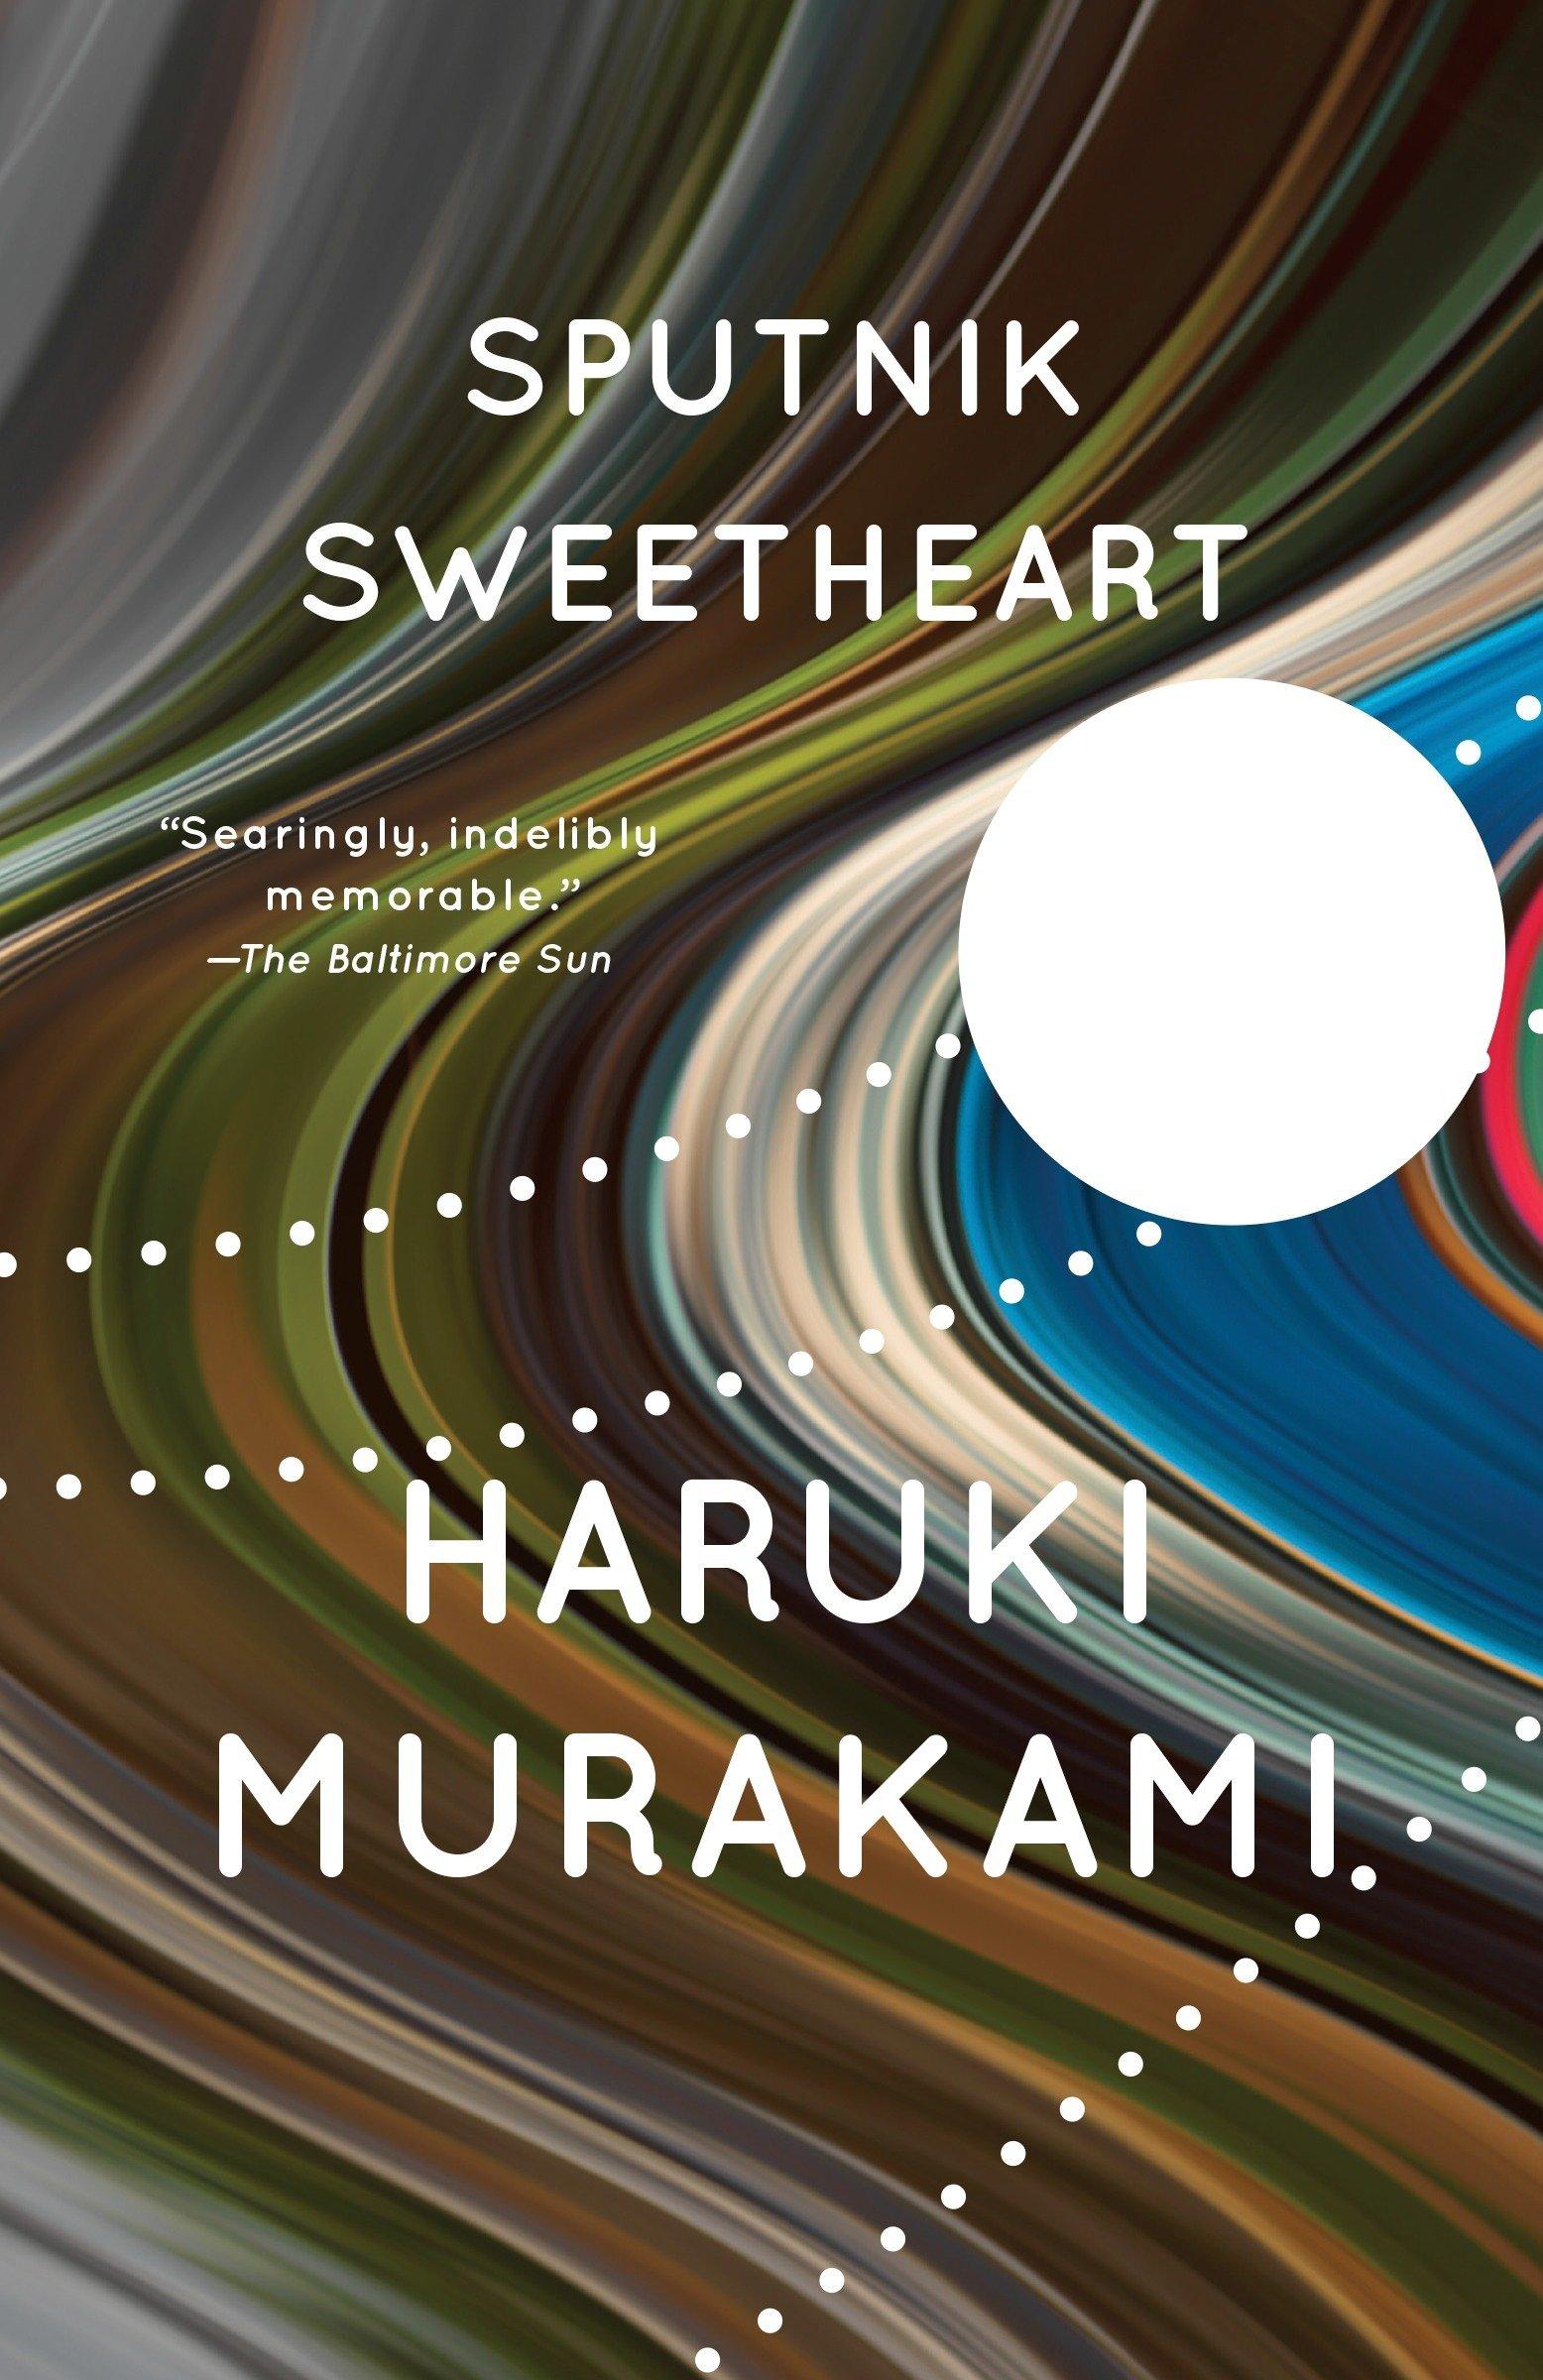 Sputnik Sweetheart Novel Haruki Murakami product image